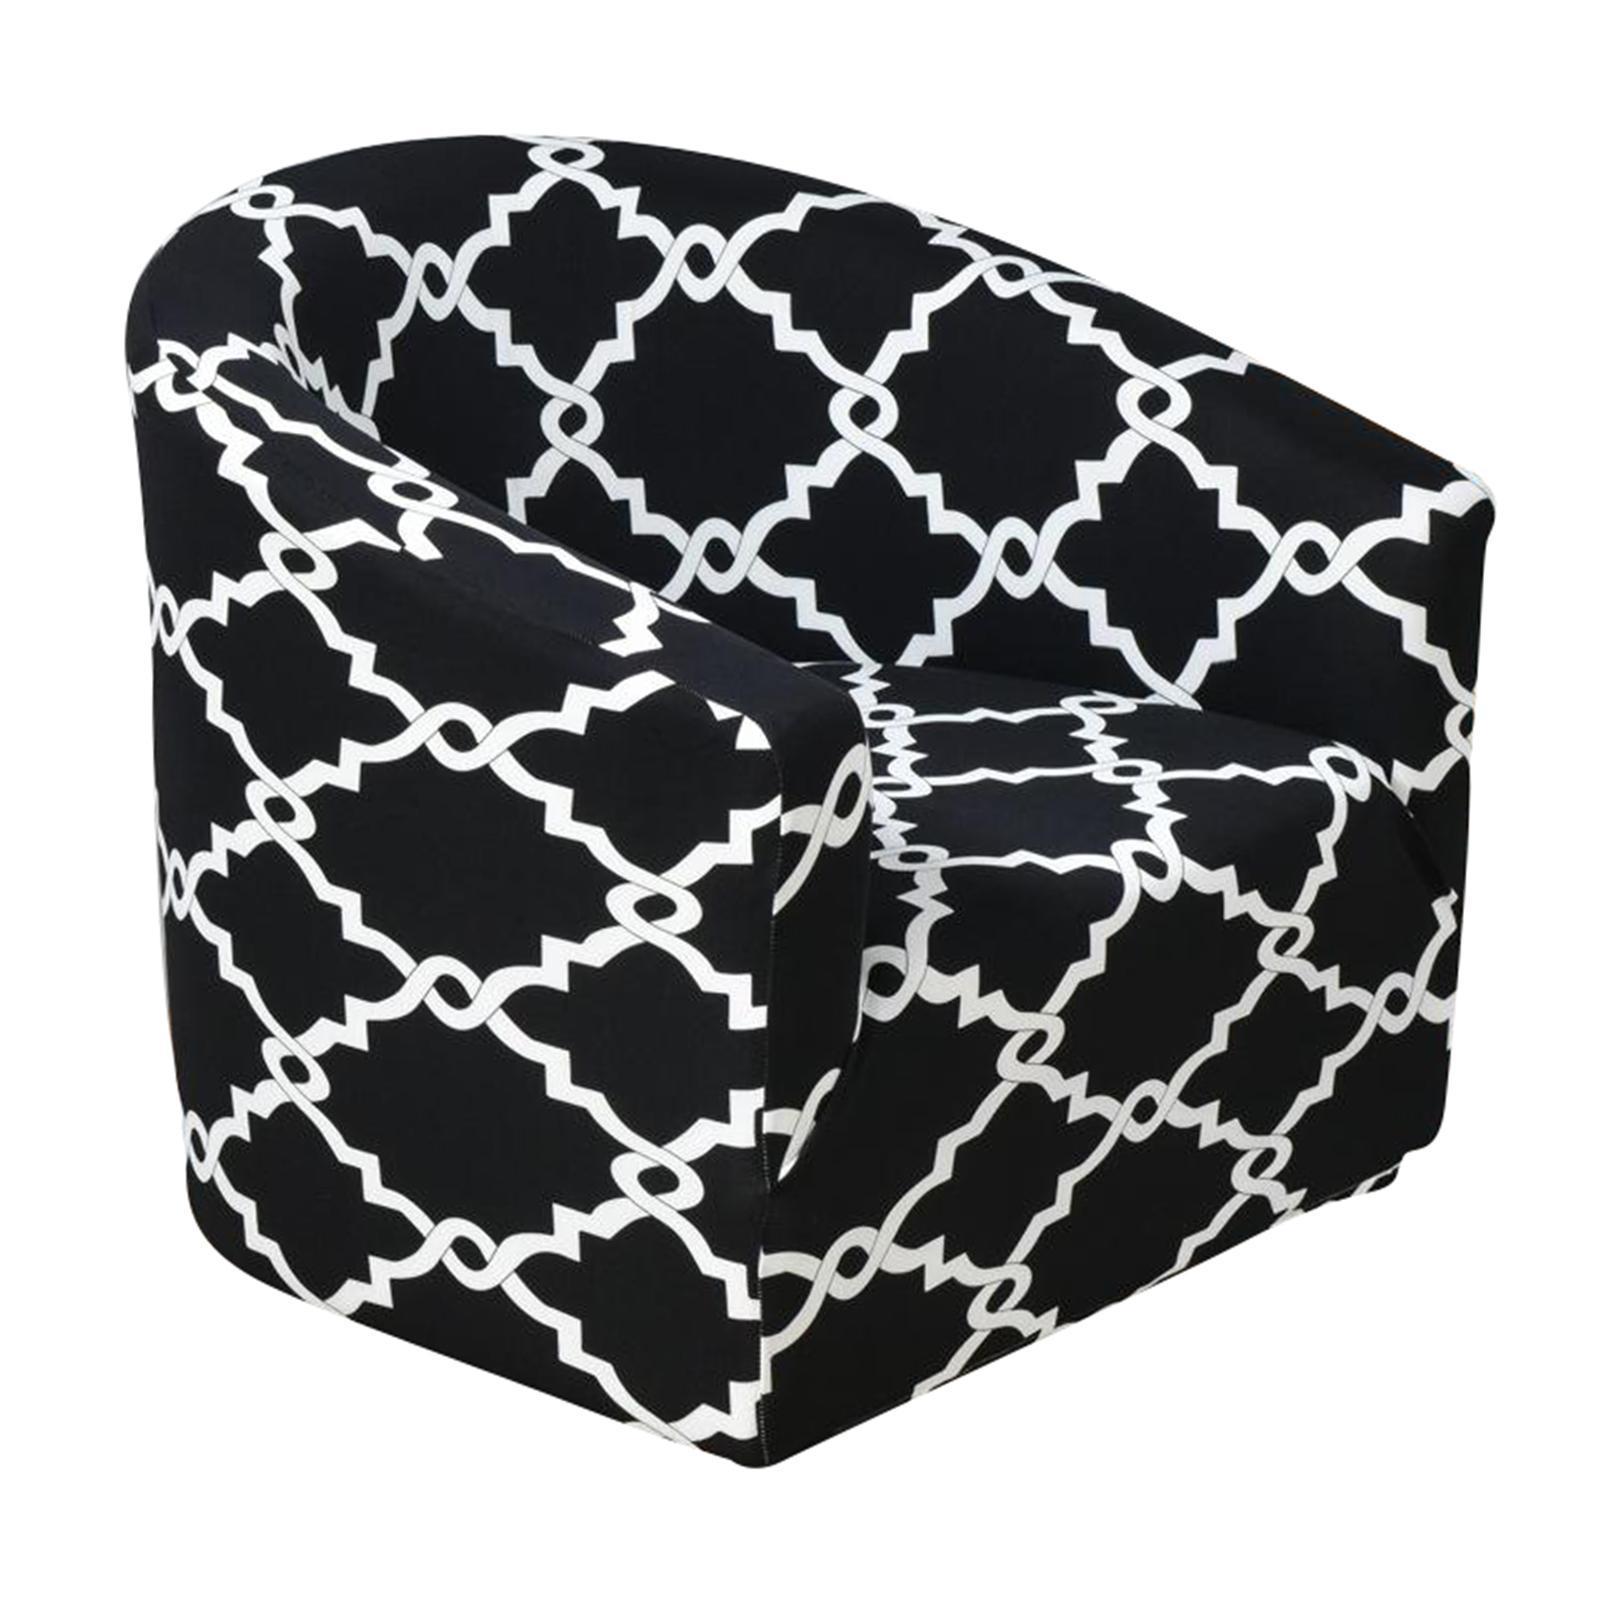 miniatura 4 - Fodera per poltrona singola per poltrona Fodera per sedia in colori assortiti